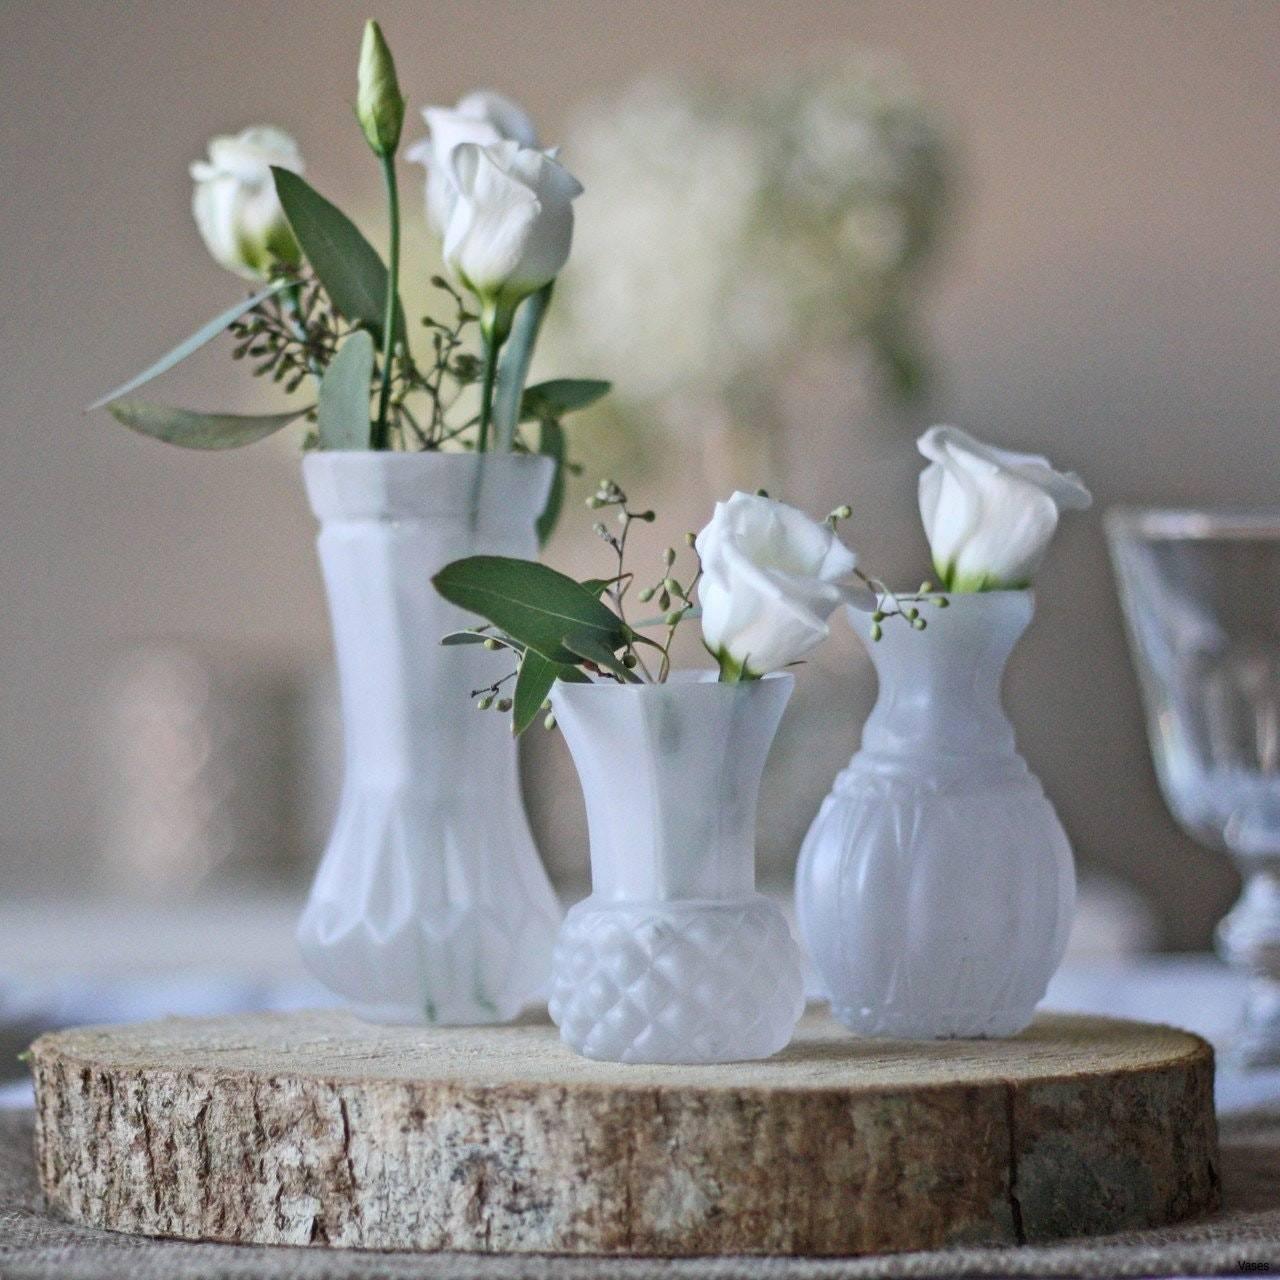 silver pedestal vase of cheap wedding table centerpieces best of jar flower 1h vases bud regarding cheap wedding table centerpieces best of jar flower 1h vases bud wedding vase centerpiece idea i